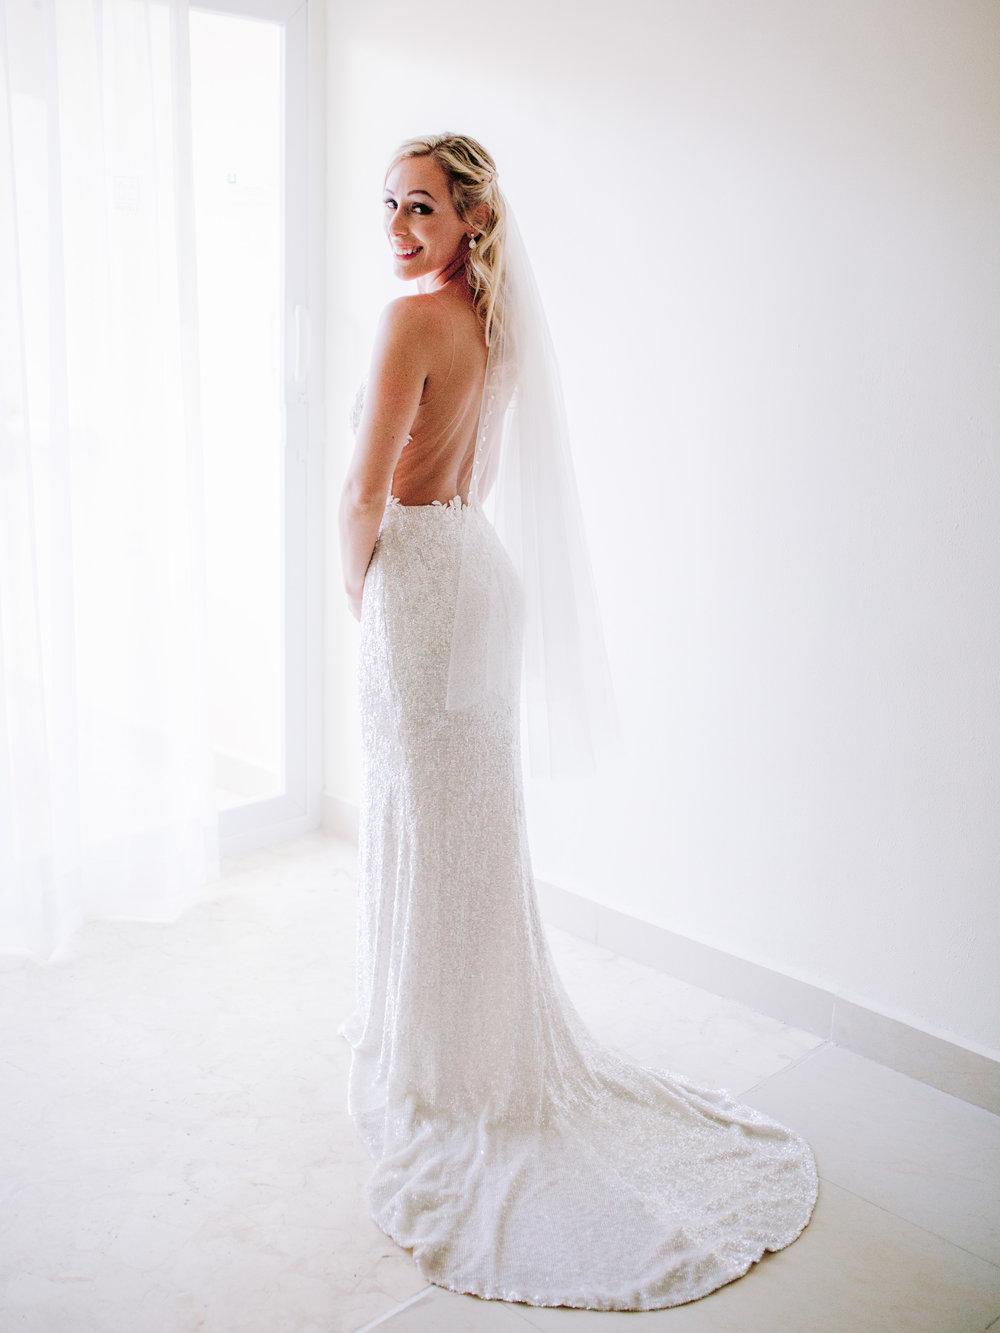 Kim_Jeff_Cancun Wedding_Getting_Ready_Kurtz_Orpia (70 of 105).jpg